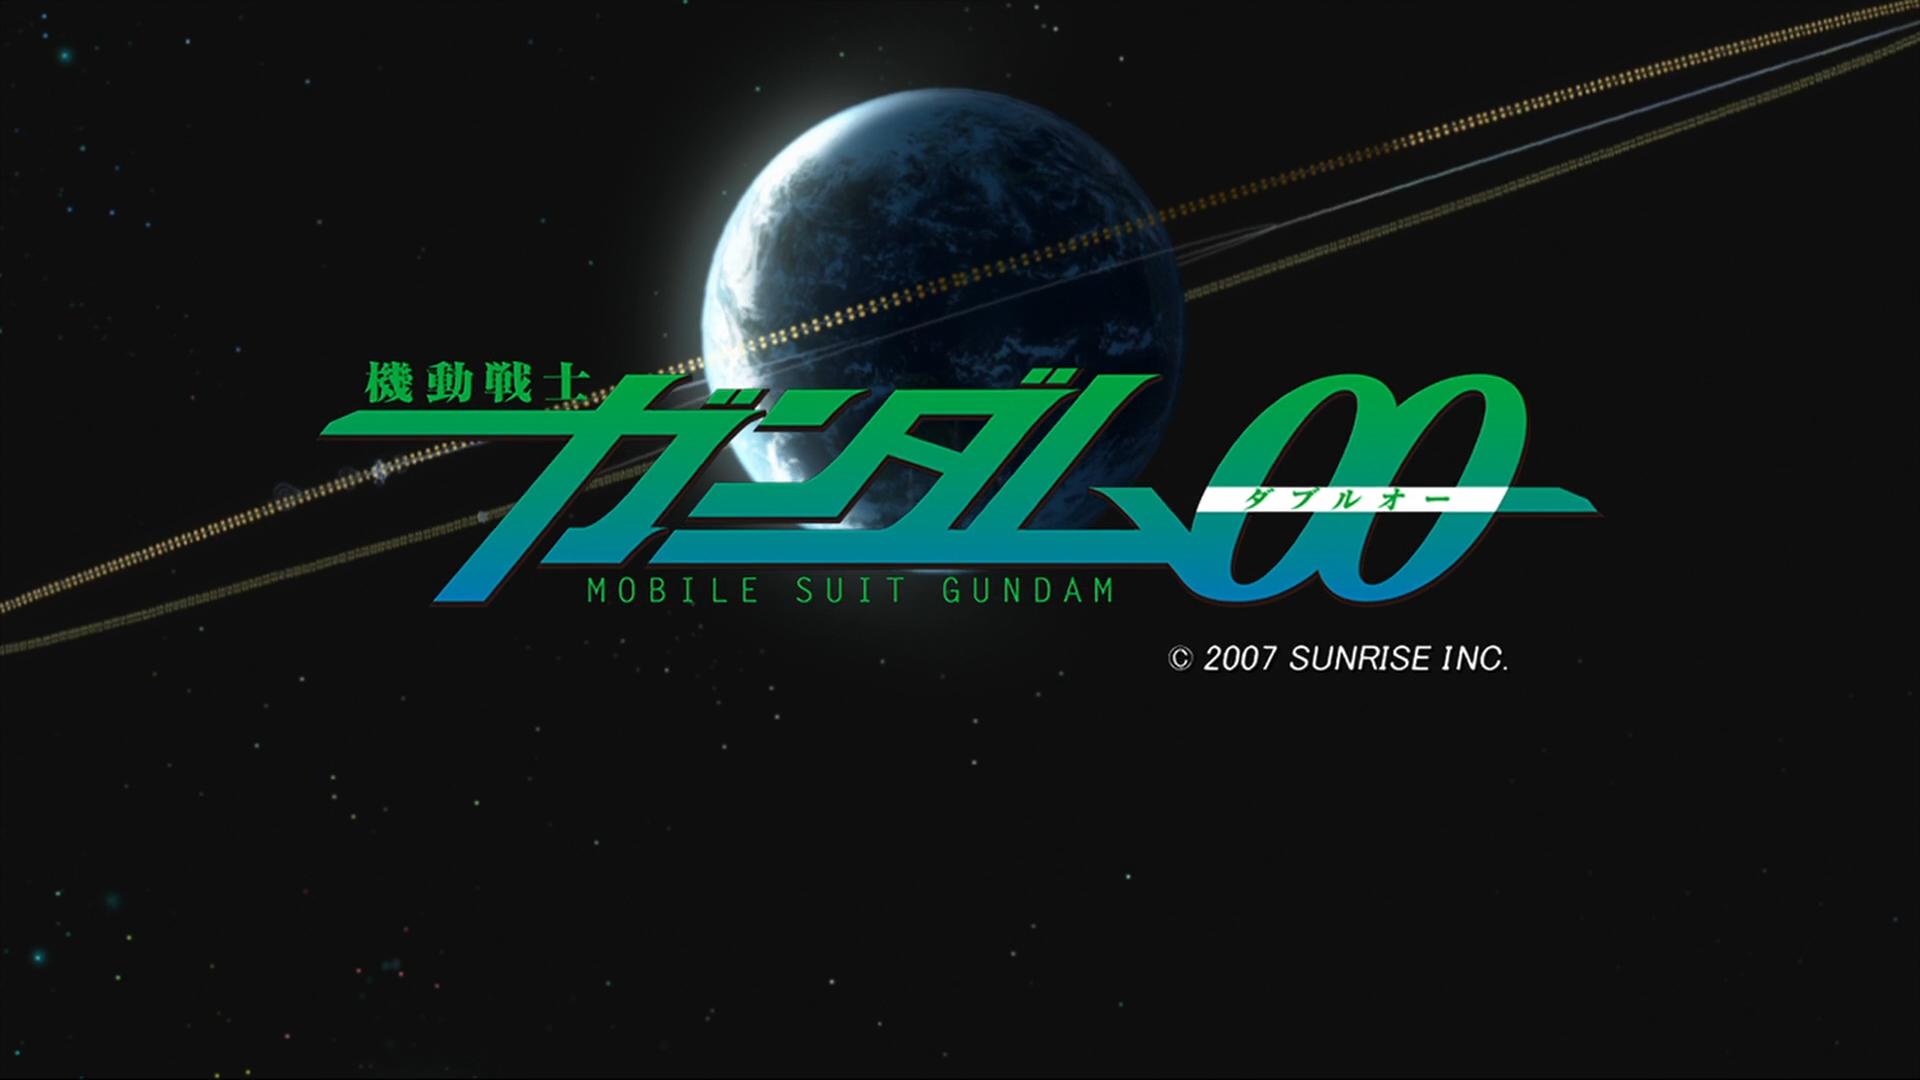 Mobile Suit Gundam 00   The Gundam Wiki   Fandom powered ...